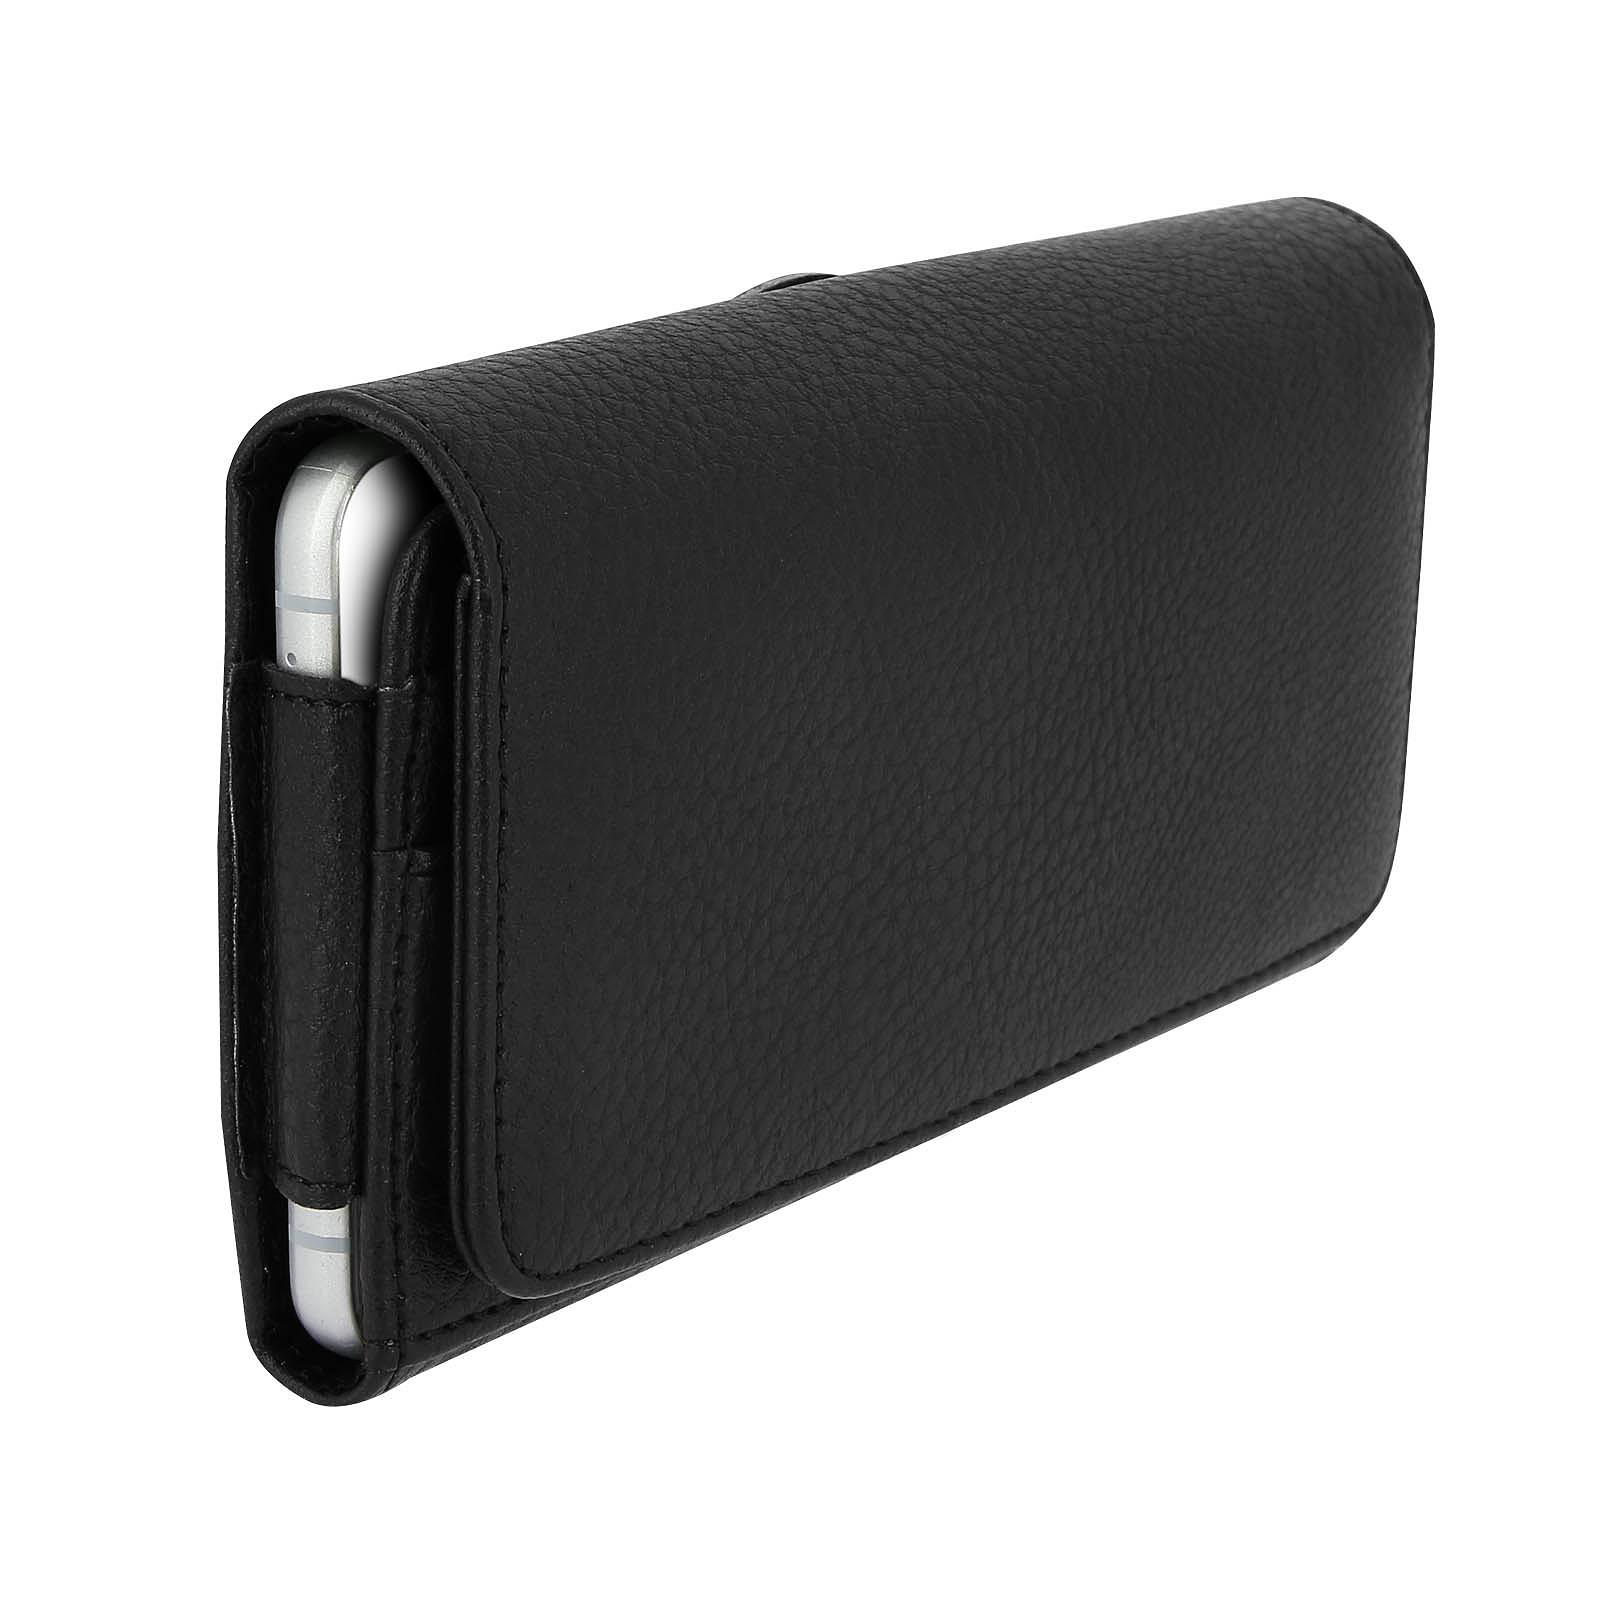 Avizar Etui ceinture Noir pour Smartphones jusqu'à 4.7'